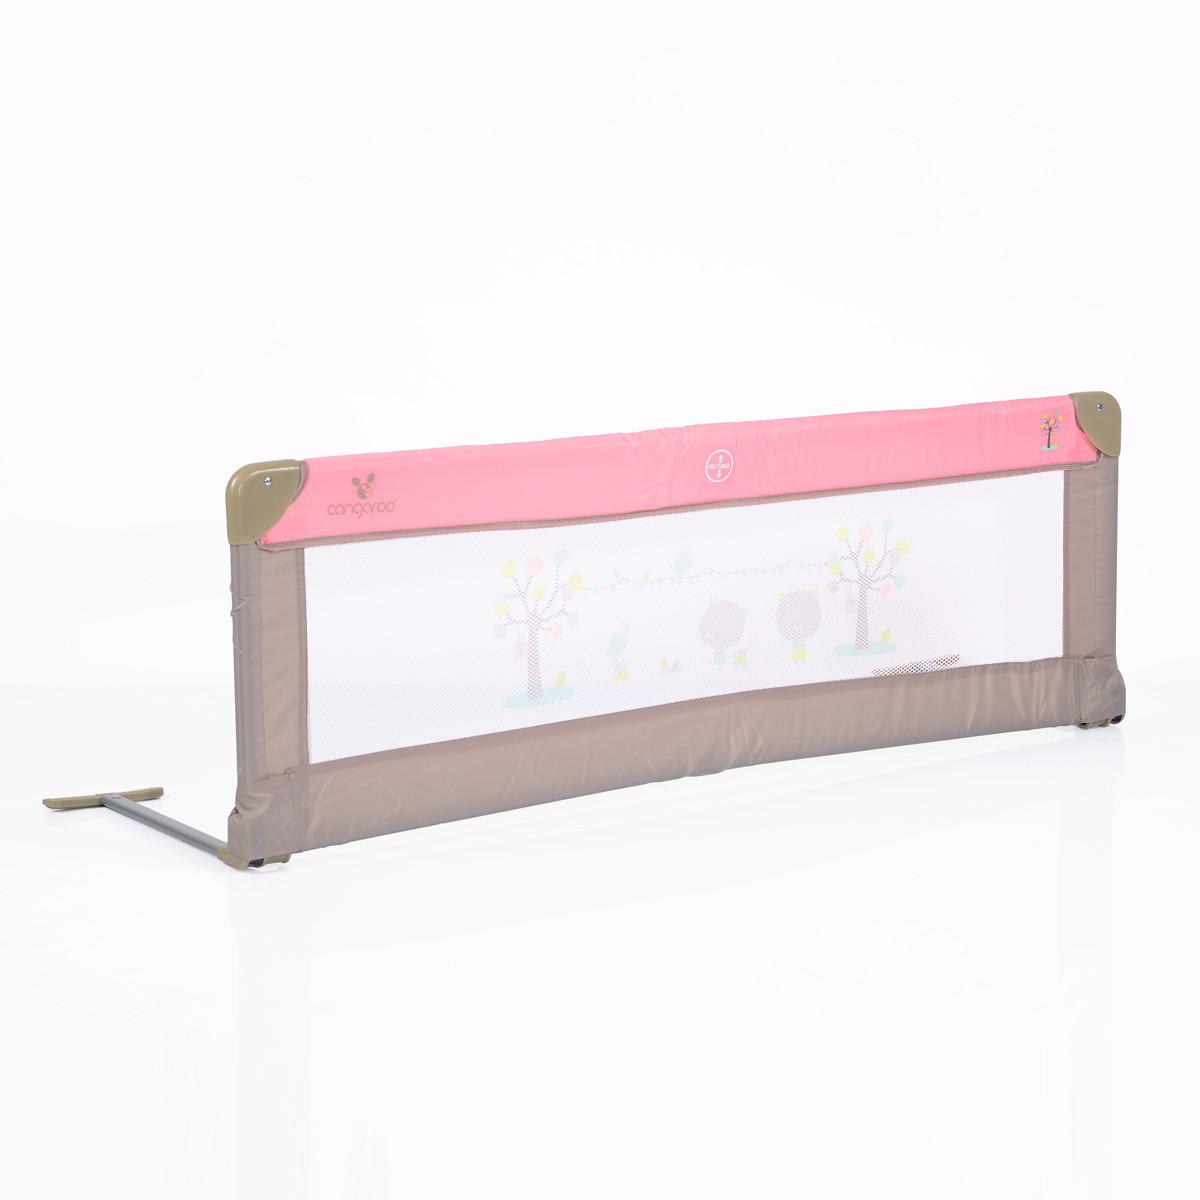 Barandillas para camas Cangaroo Relax Pink